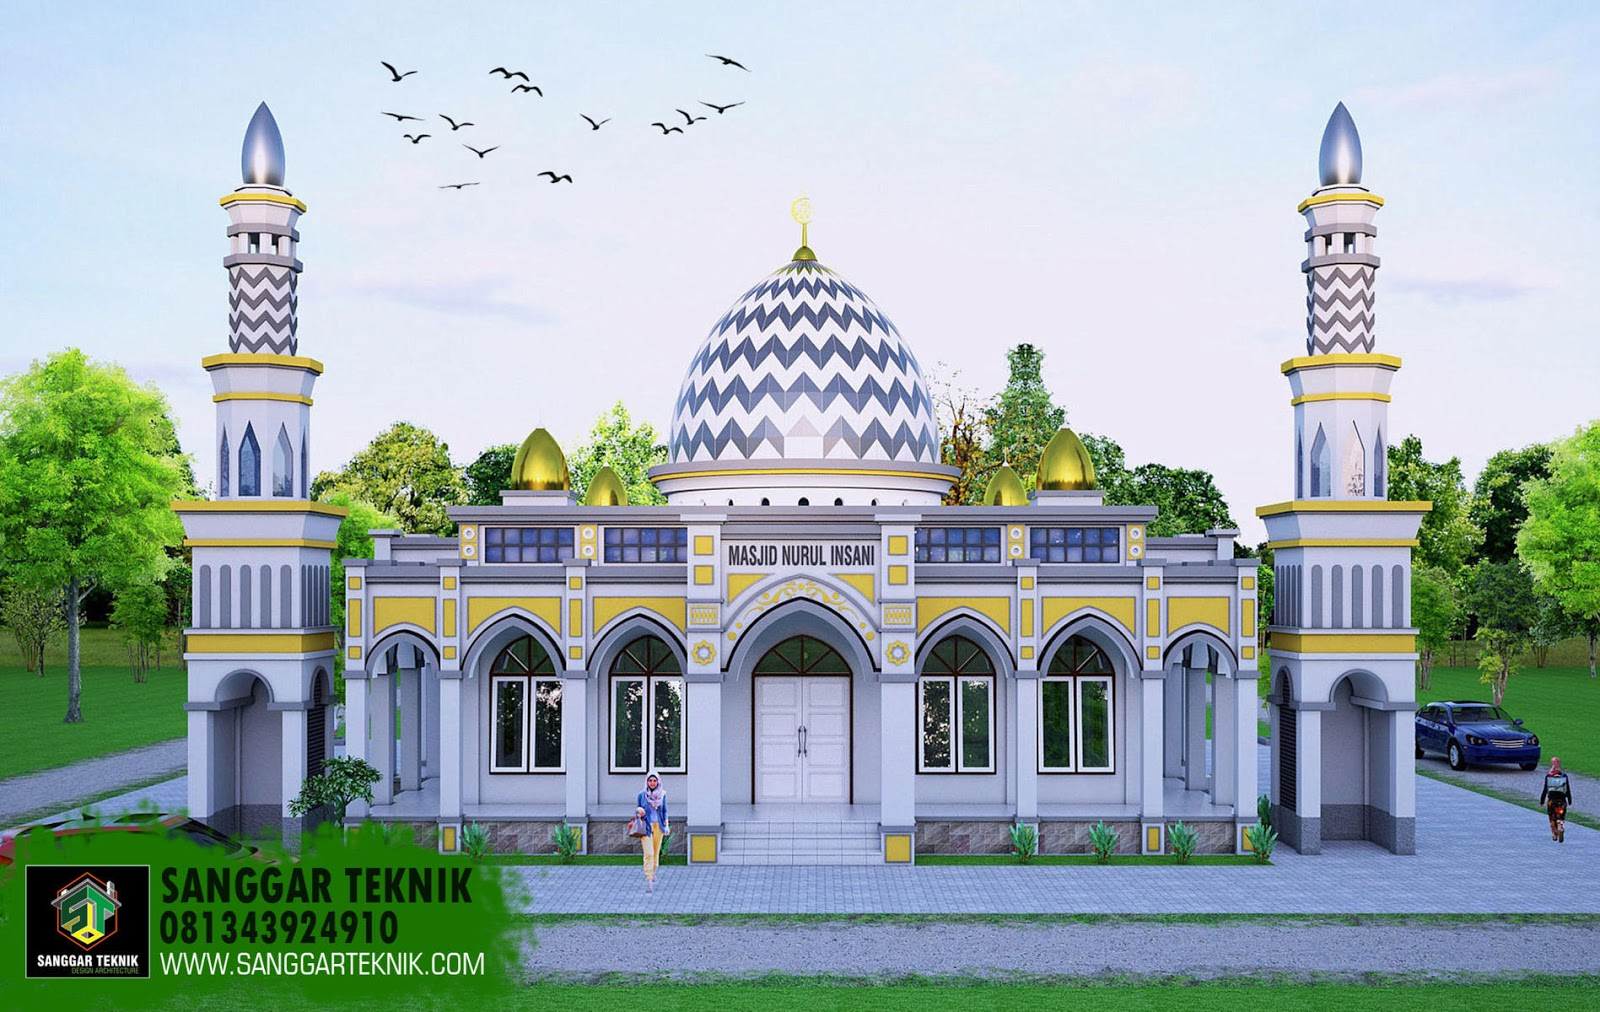 78  Gambar Masjid Minimalis Tampak Depan Paling Bagus